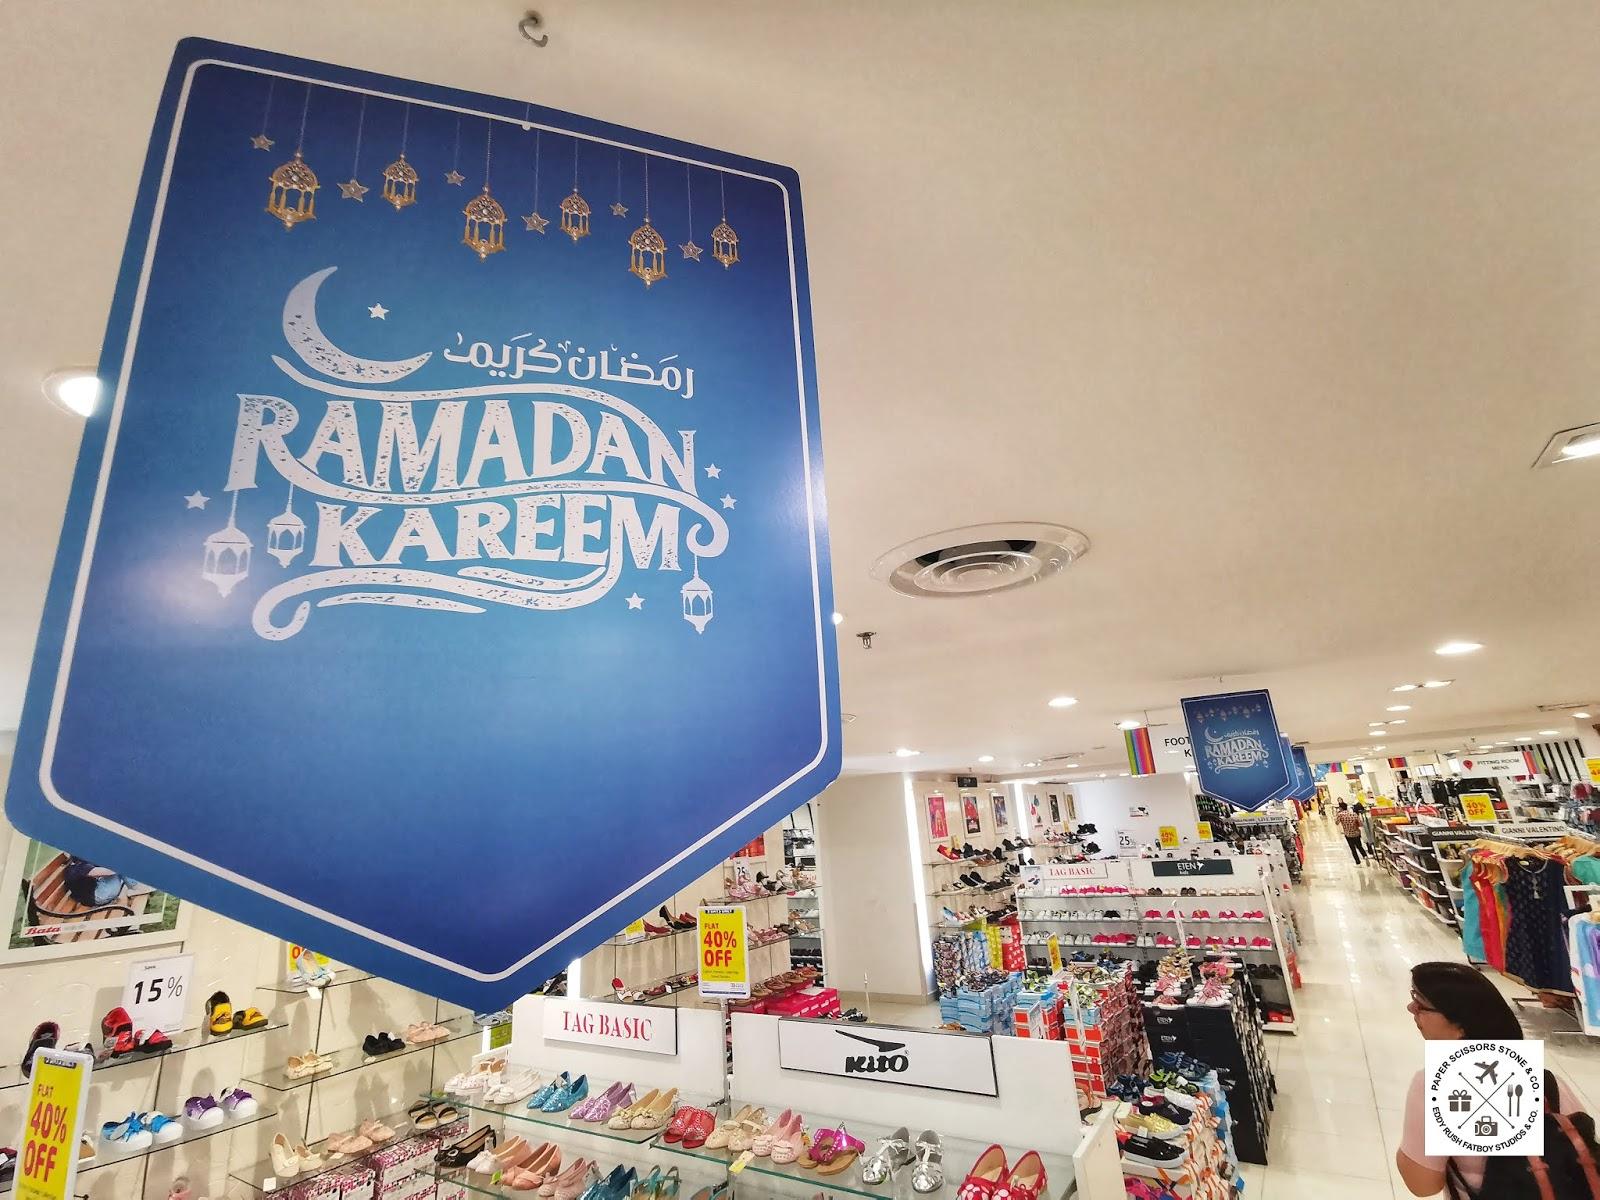 This Ramadan, Shop at Lulu Hypermarket, Kuala Lumpur | Malaysia